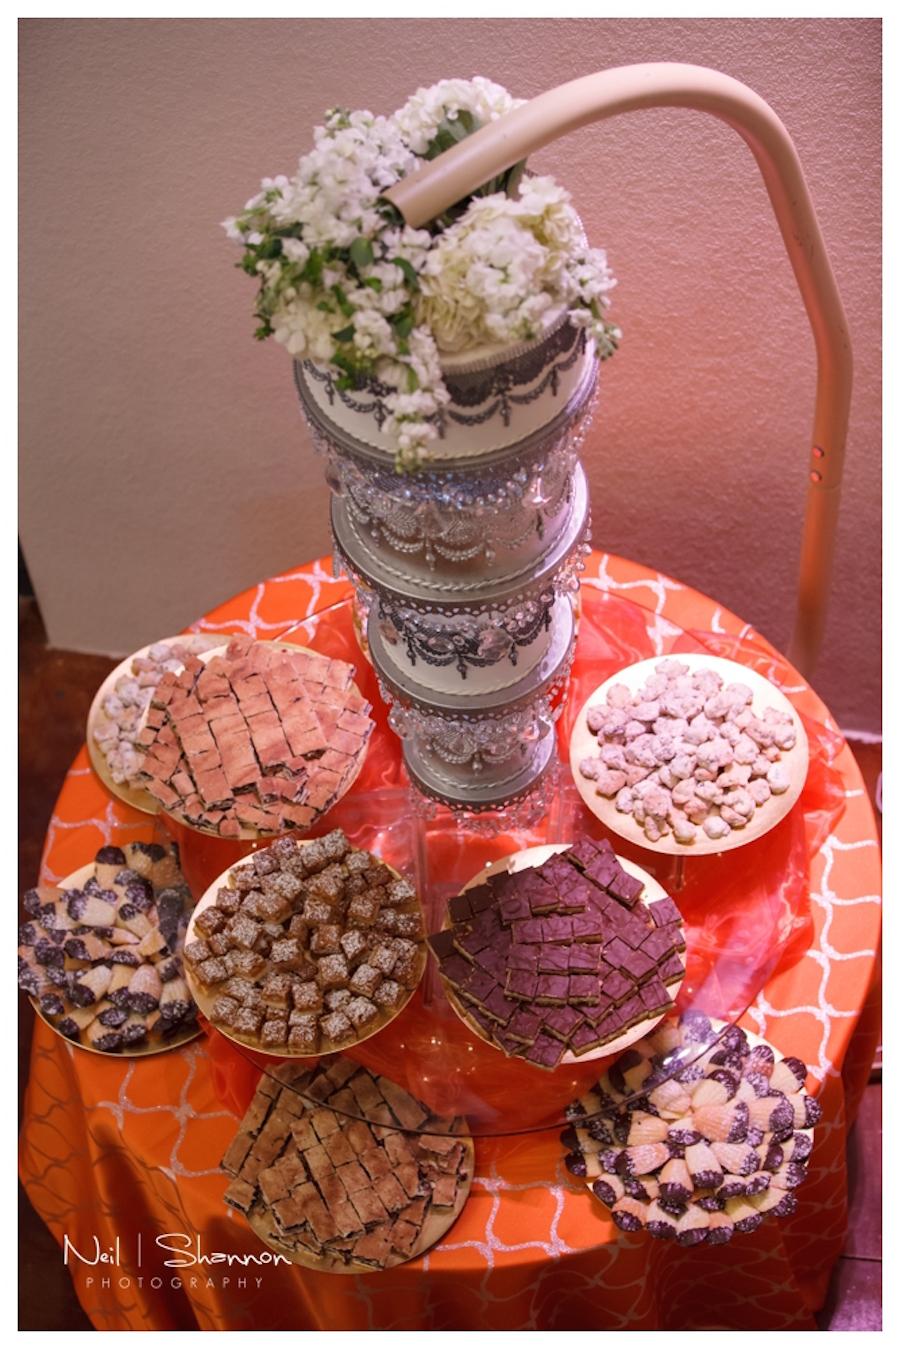 White and Gold Round Hanging Wedding Cake | Sarasota Wedding Cake and Dessert Baker The Cake Zone